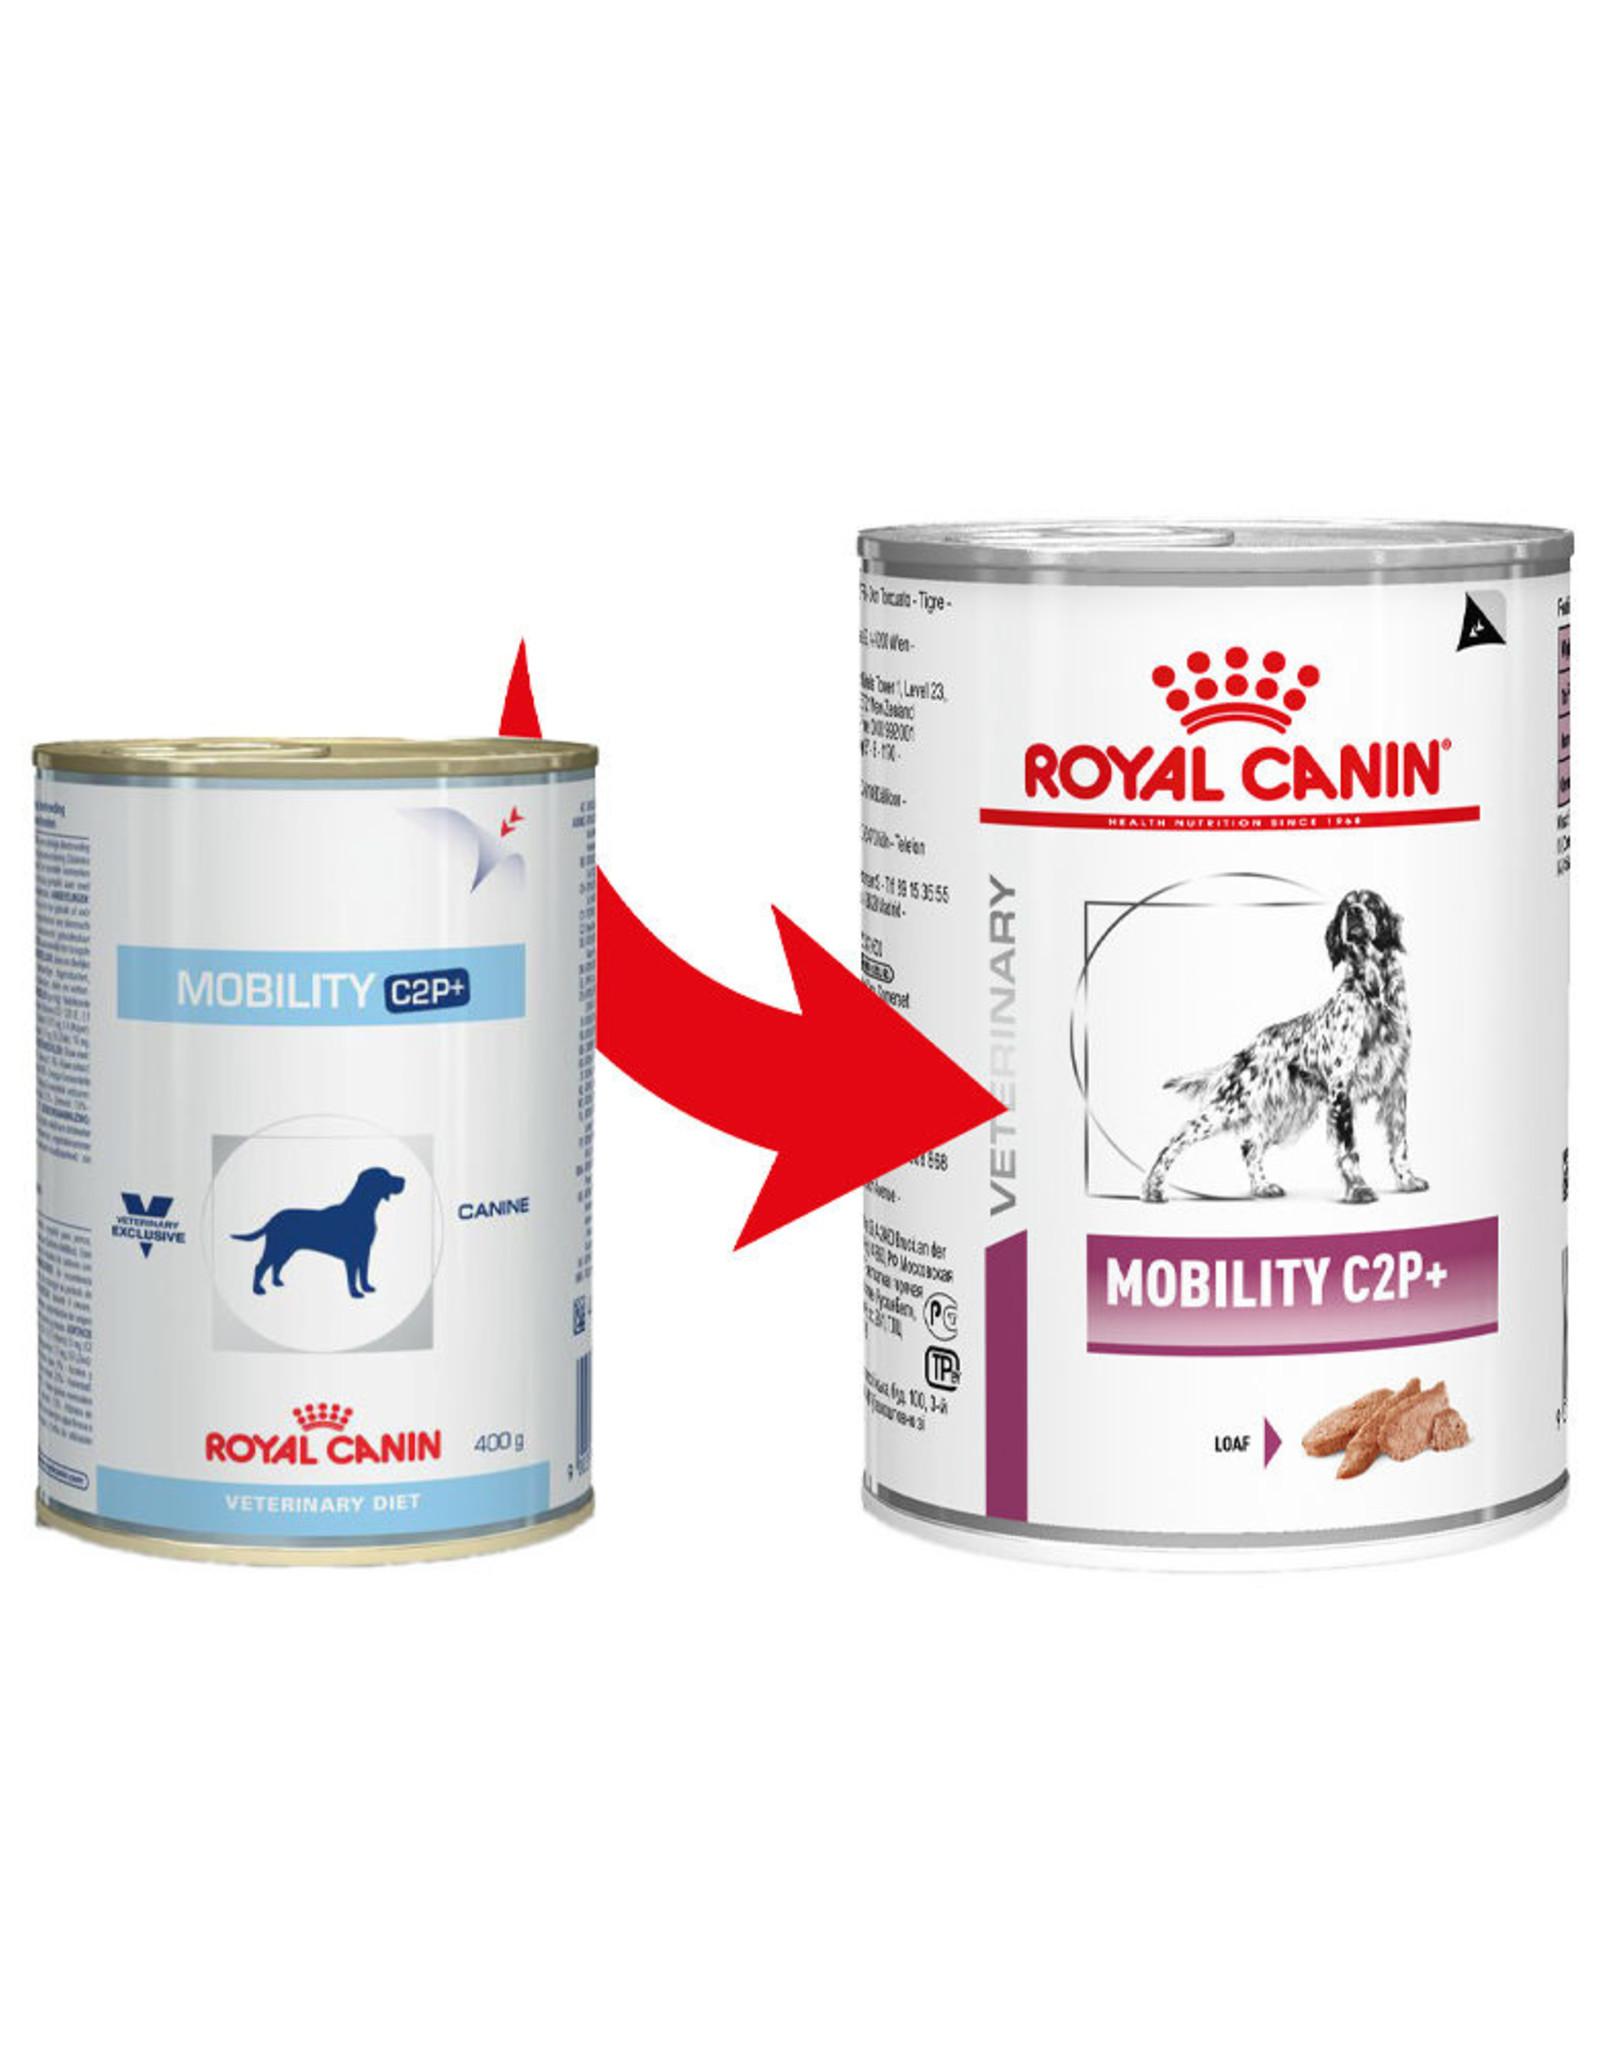 Royal Canin Royal Canin Mobility C2p 12x400g